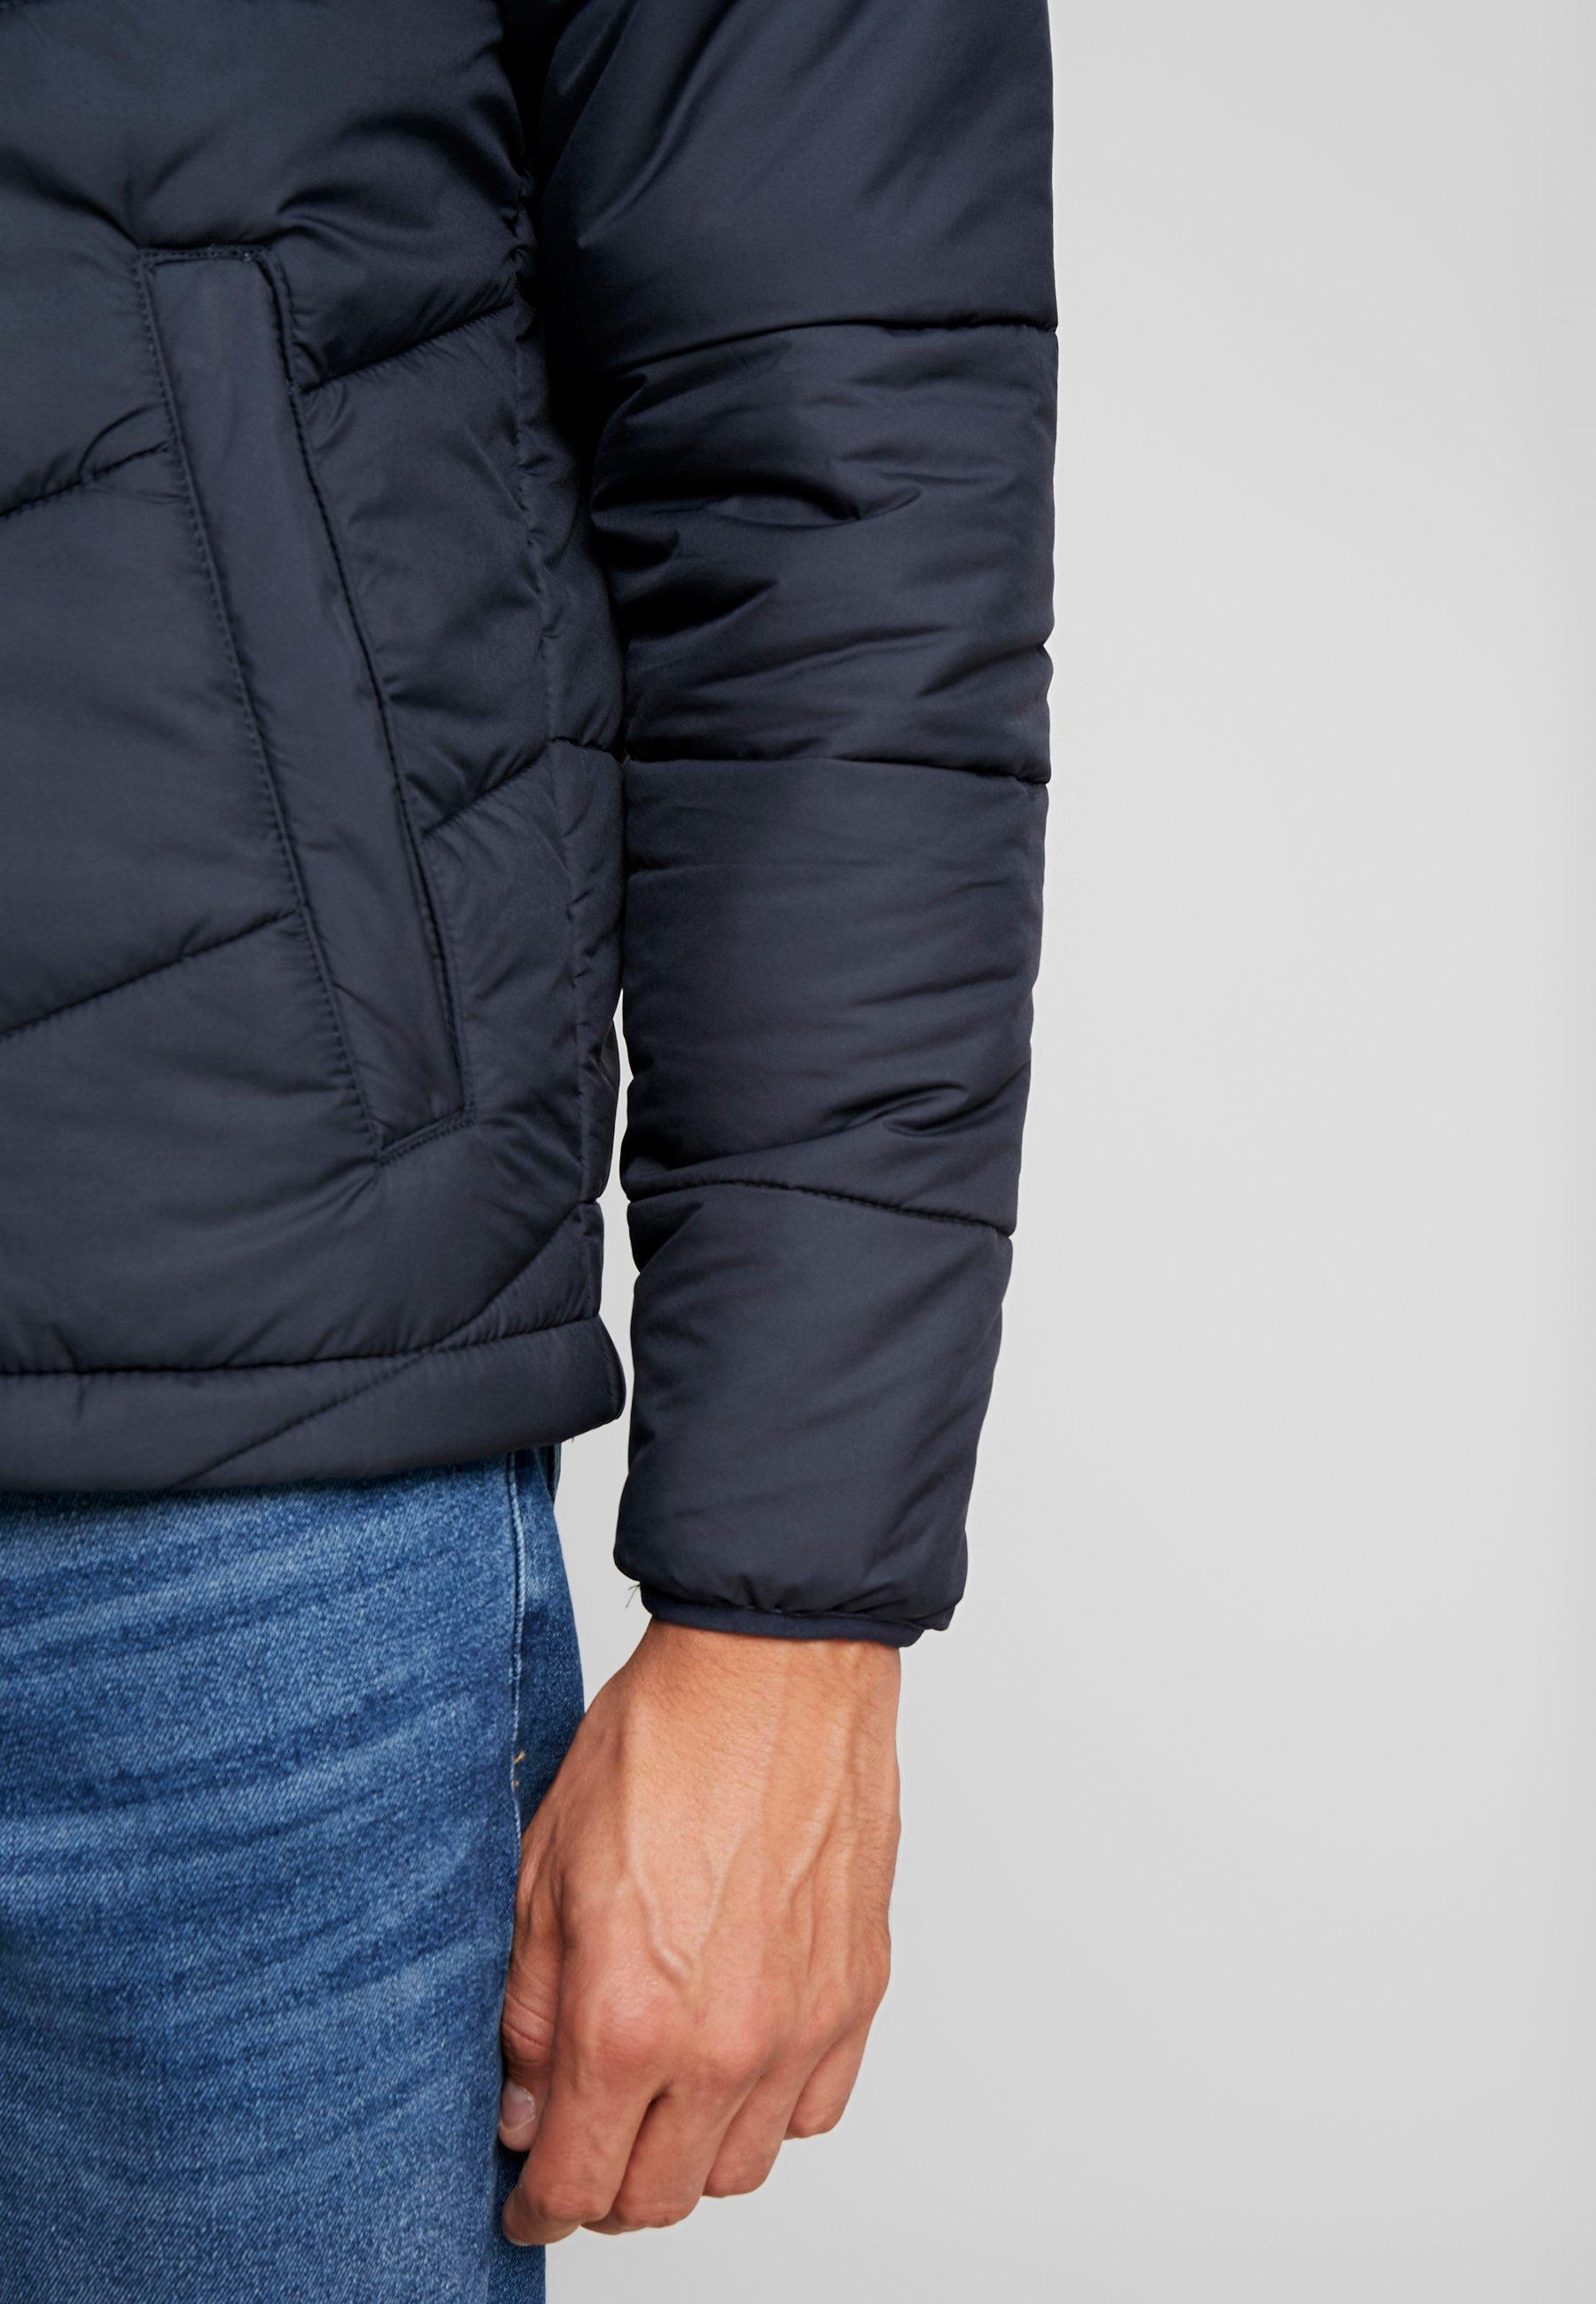 Pktakm Hood Produkt Puffer Blazer Navy Mi saison Forum JacketVeste dWoexCQrB